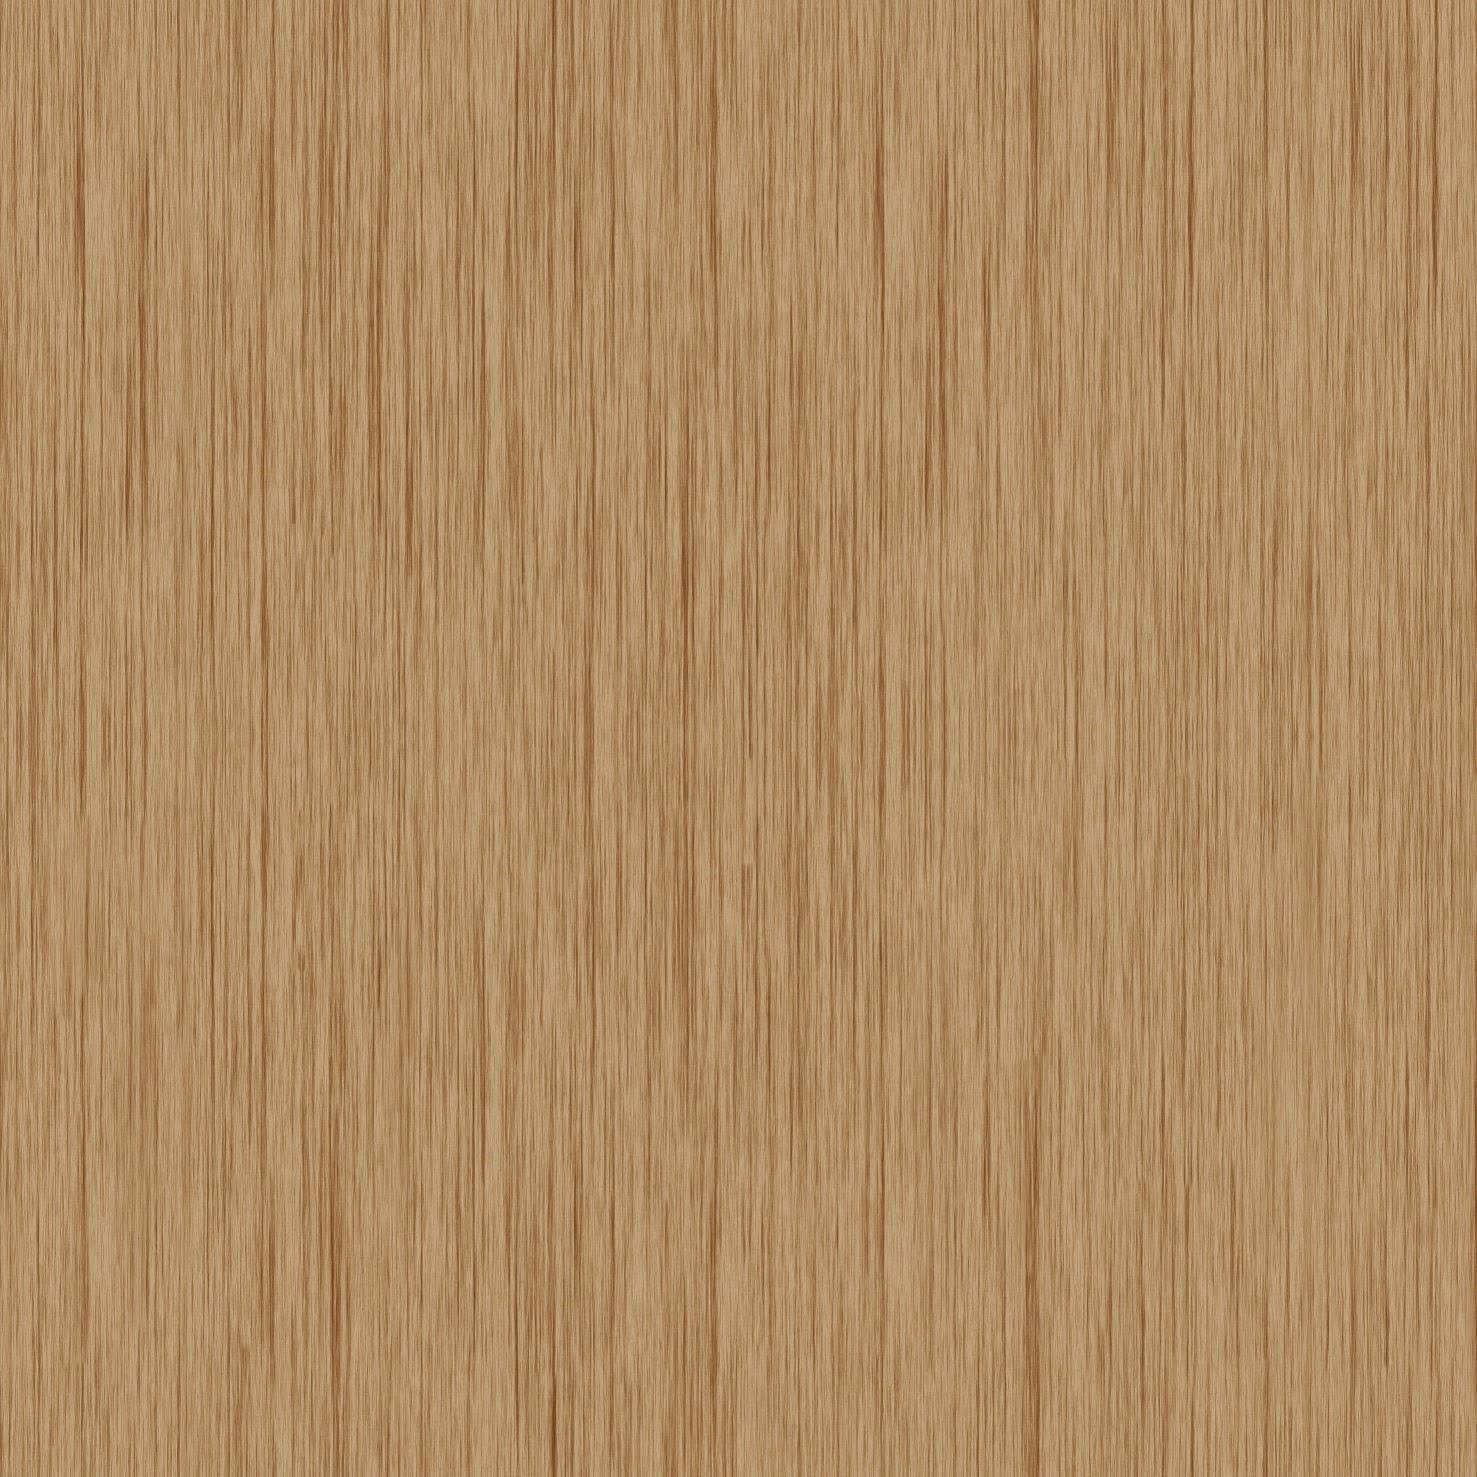 simo texture seamless legno vari colori